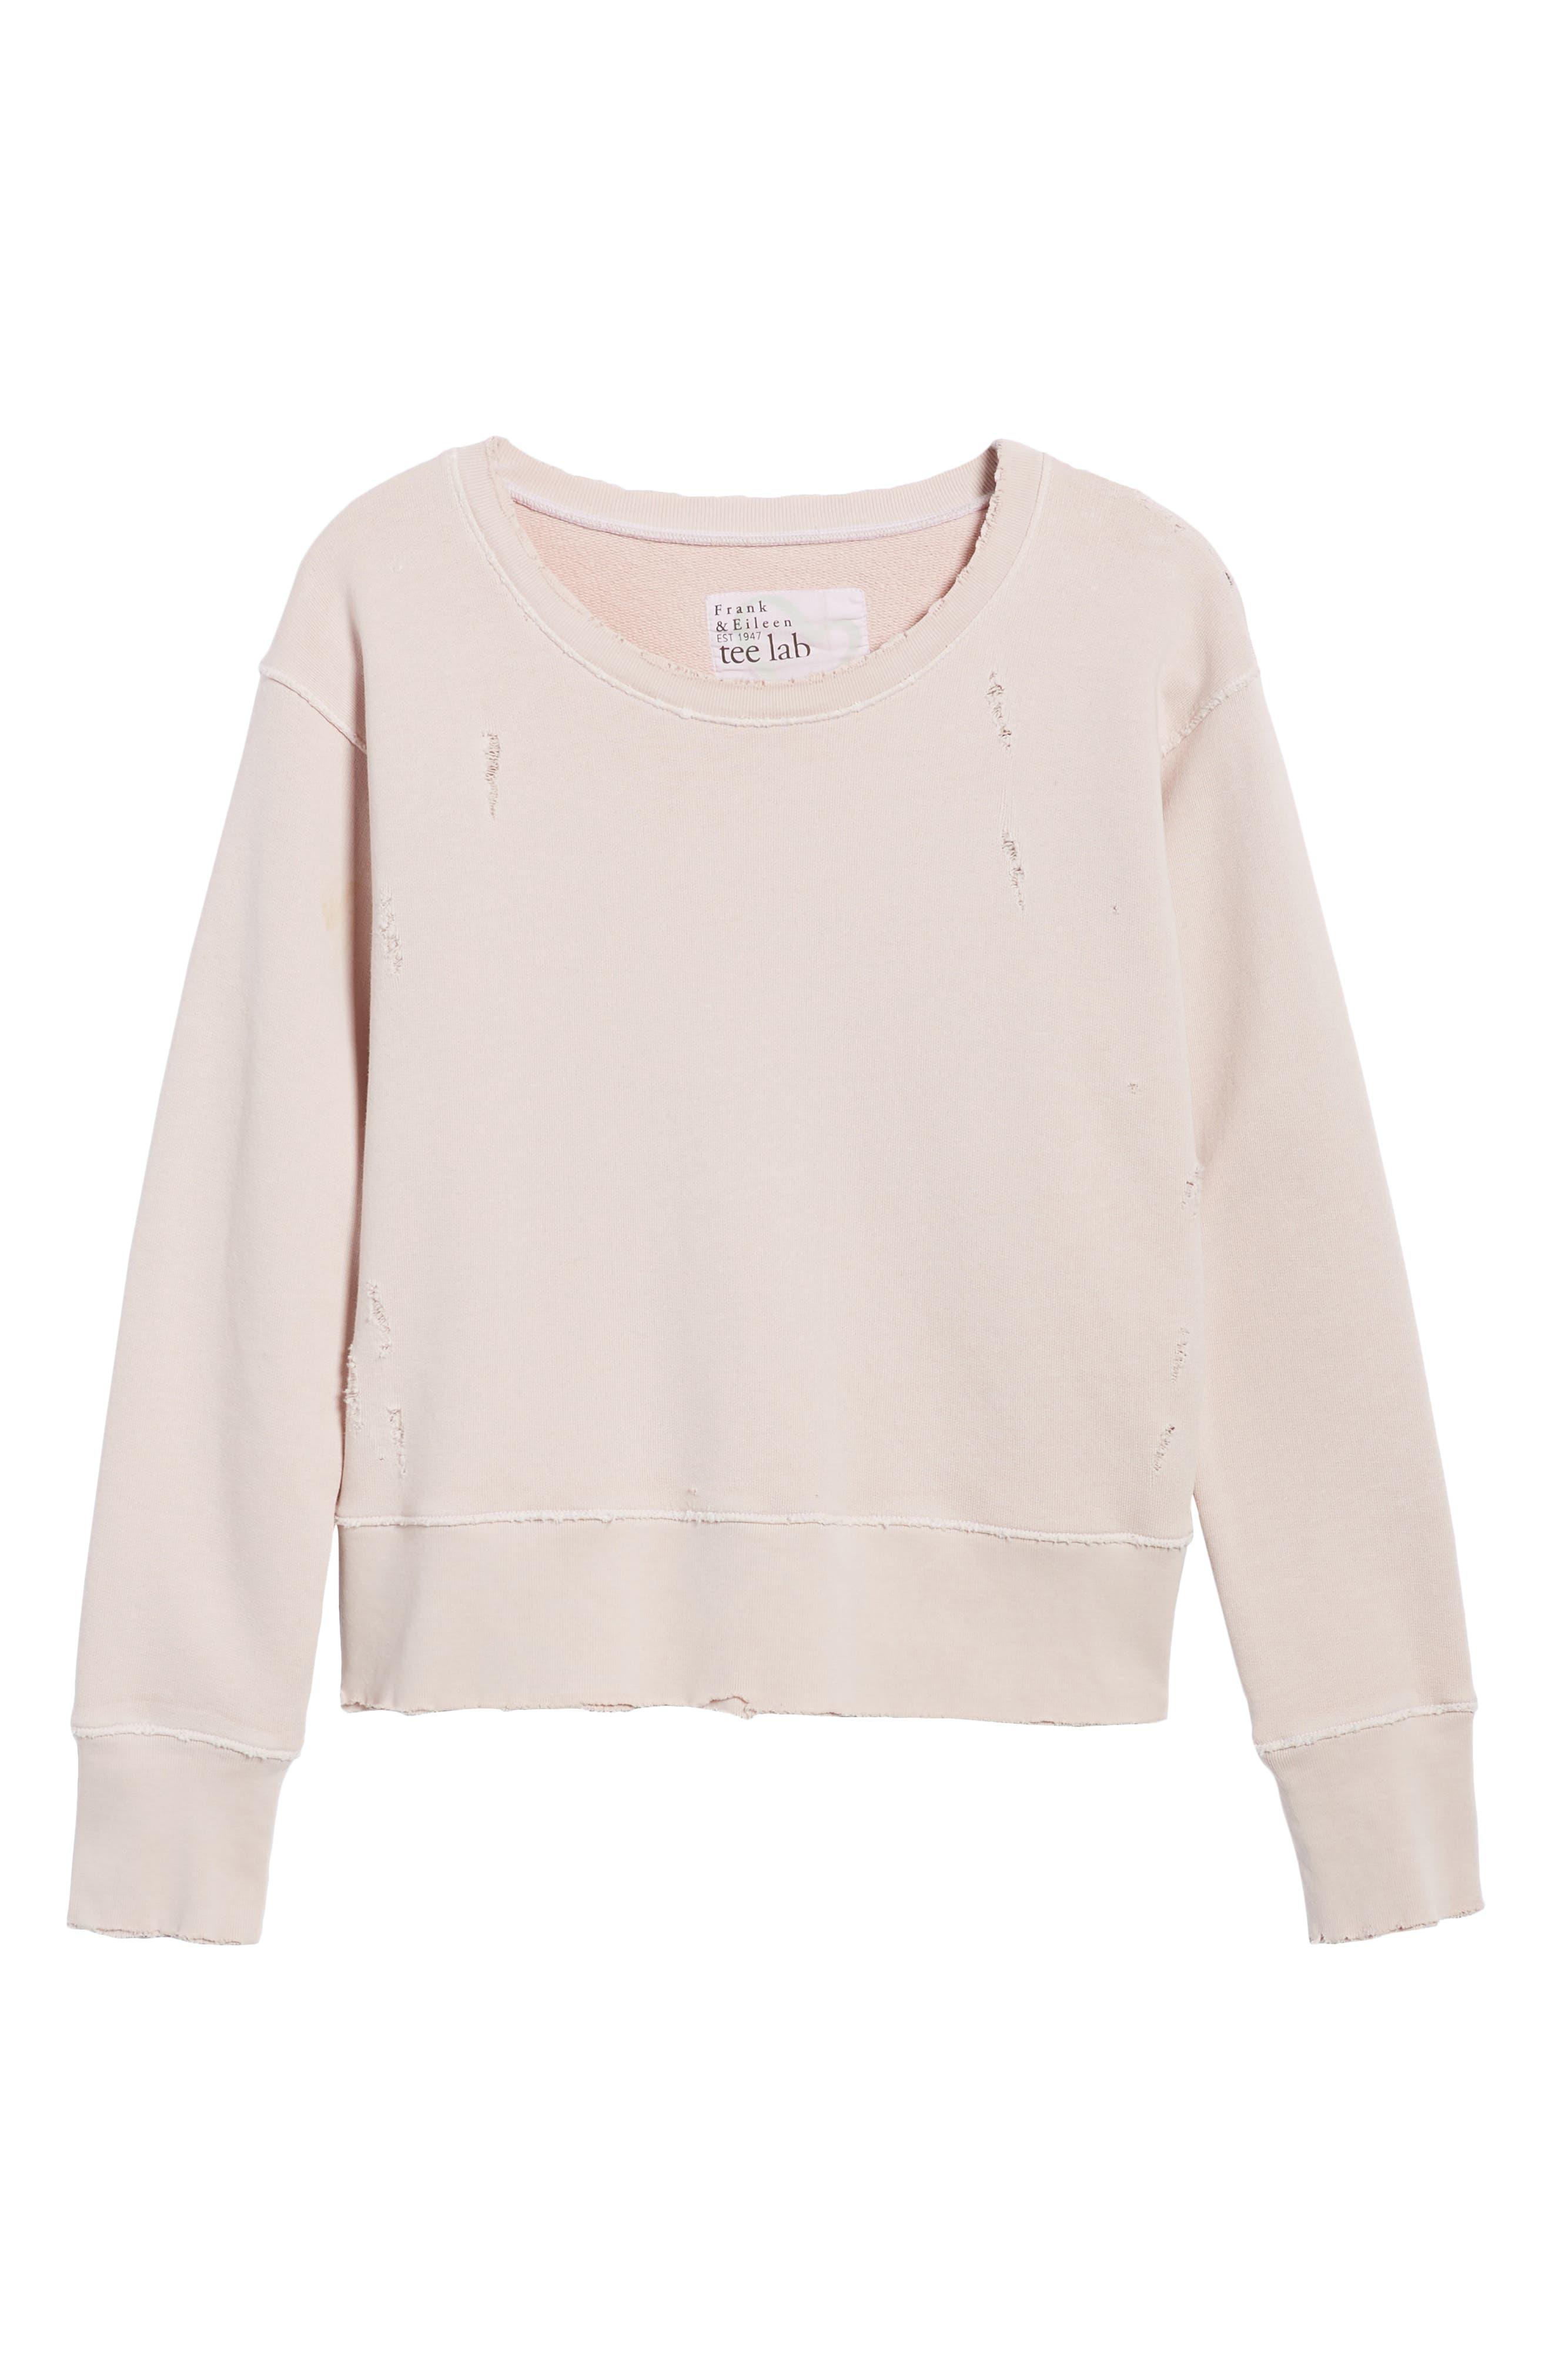 Tee Lab Cotton Sweatshirt,                             Alternate thumbnail 6, color,